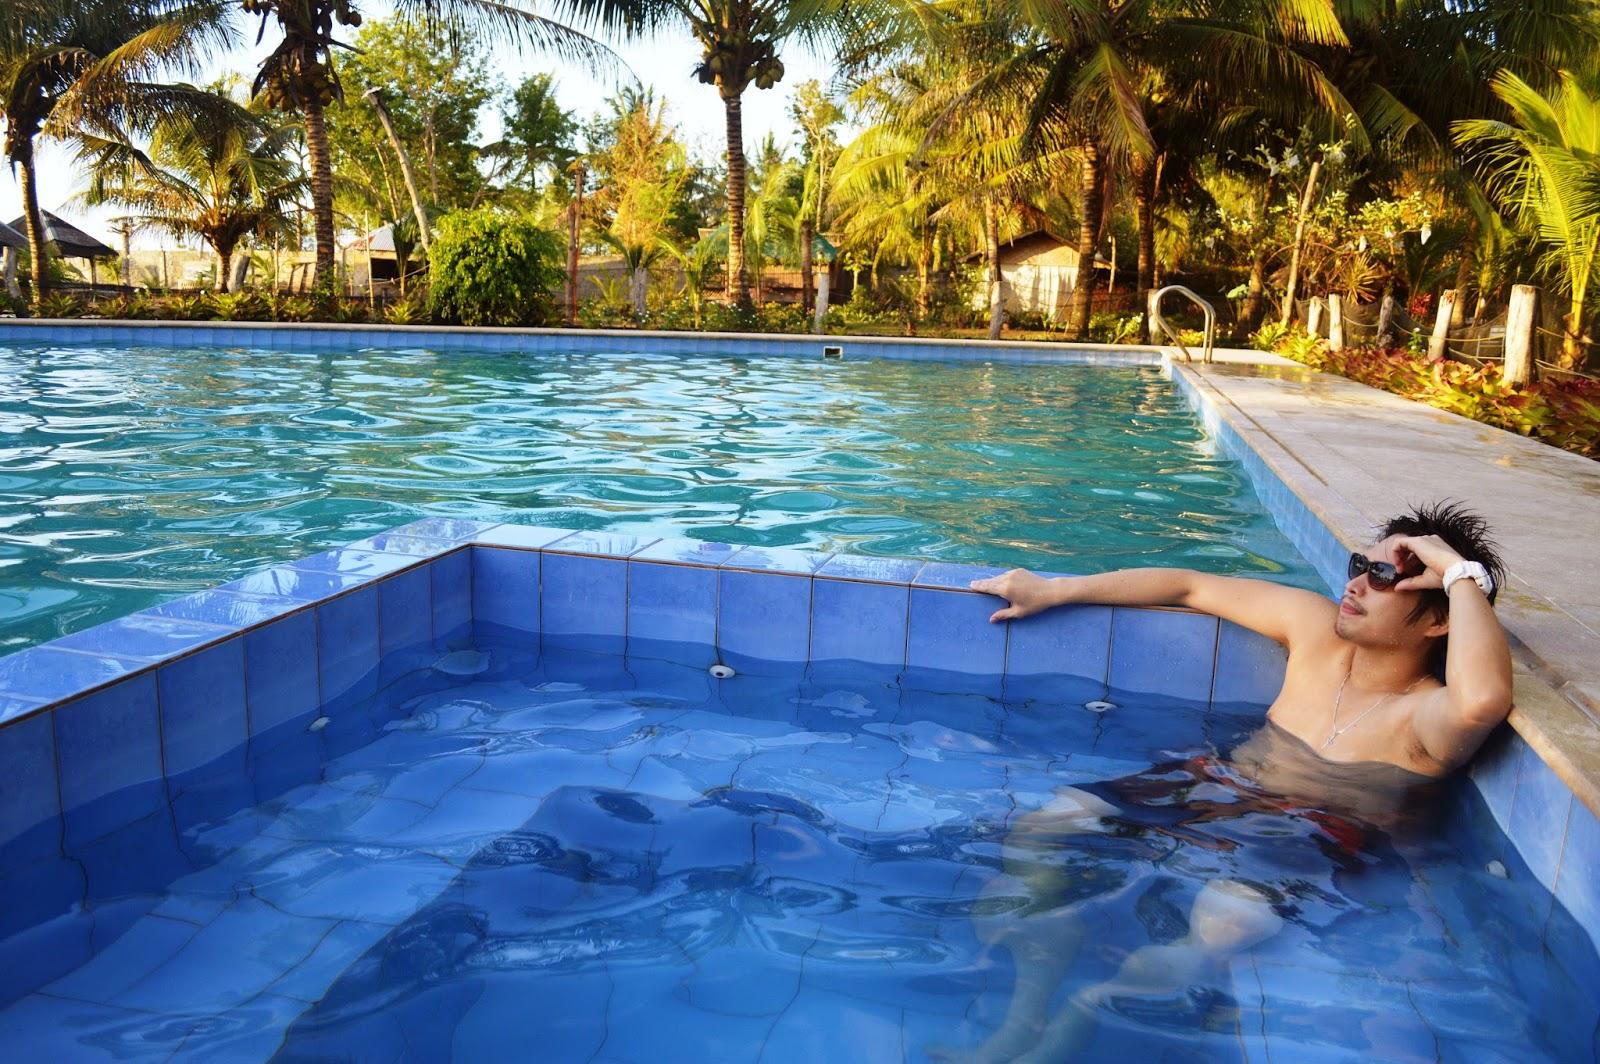 Tauhai Beach Resort Room Rates